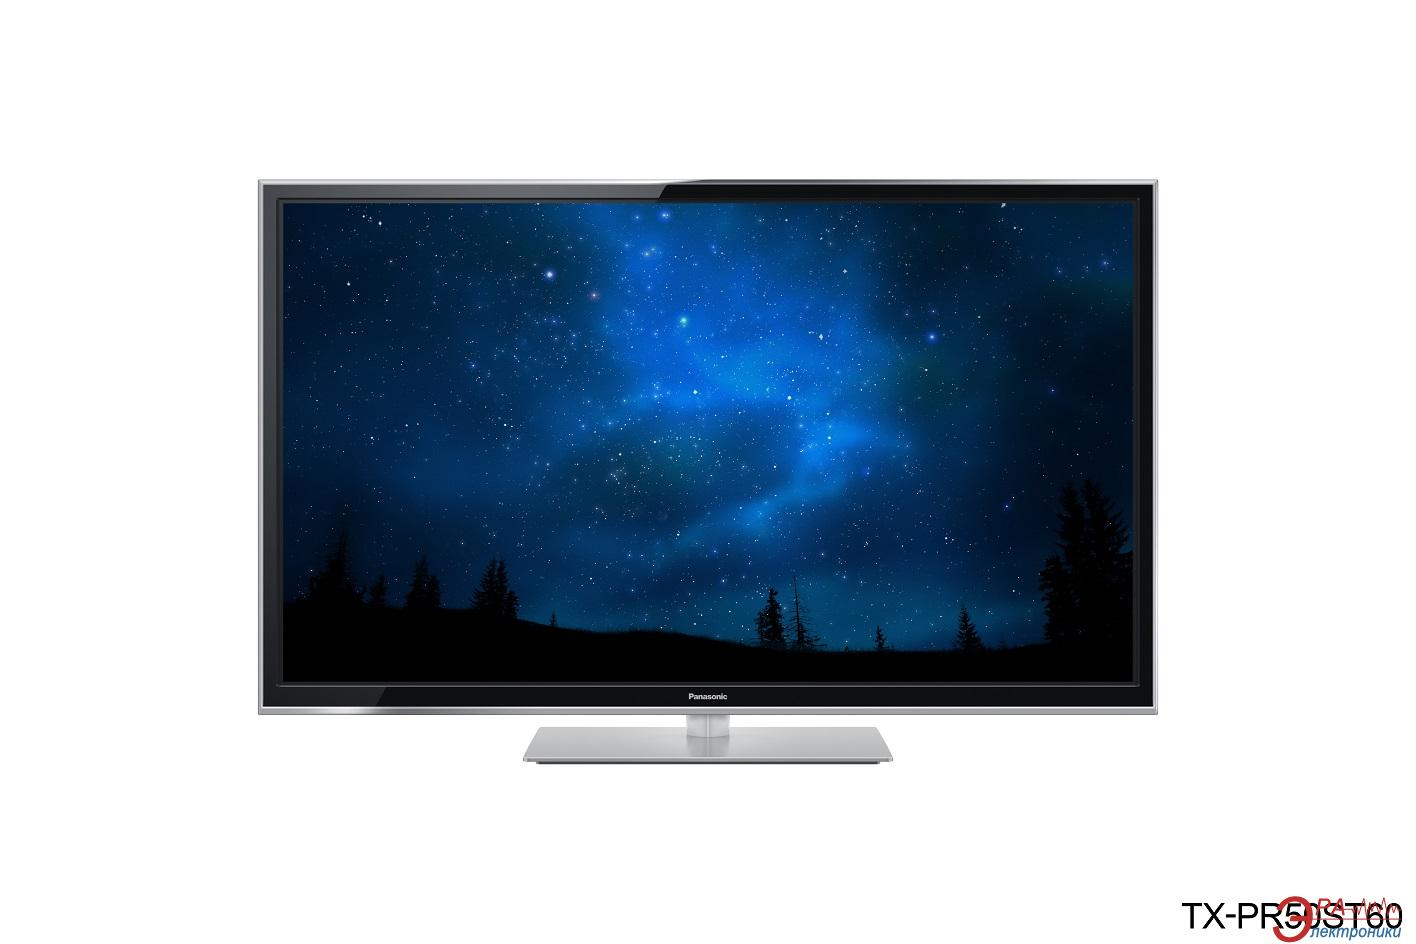 Плазменный телевизор 50 Panasonic TX-PR50ST60